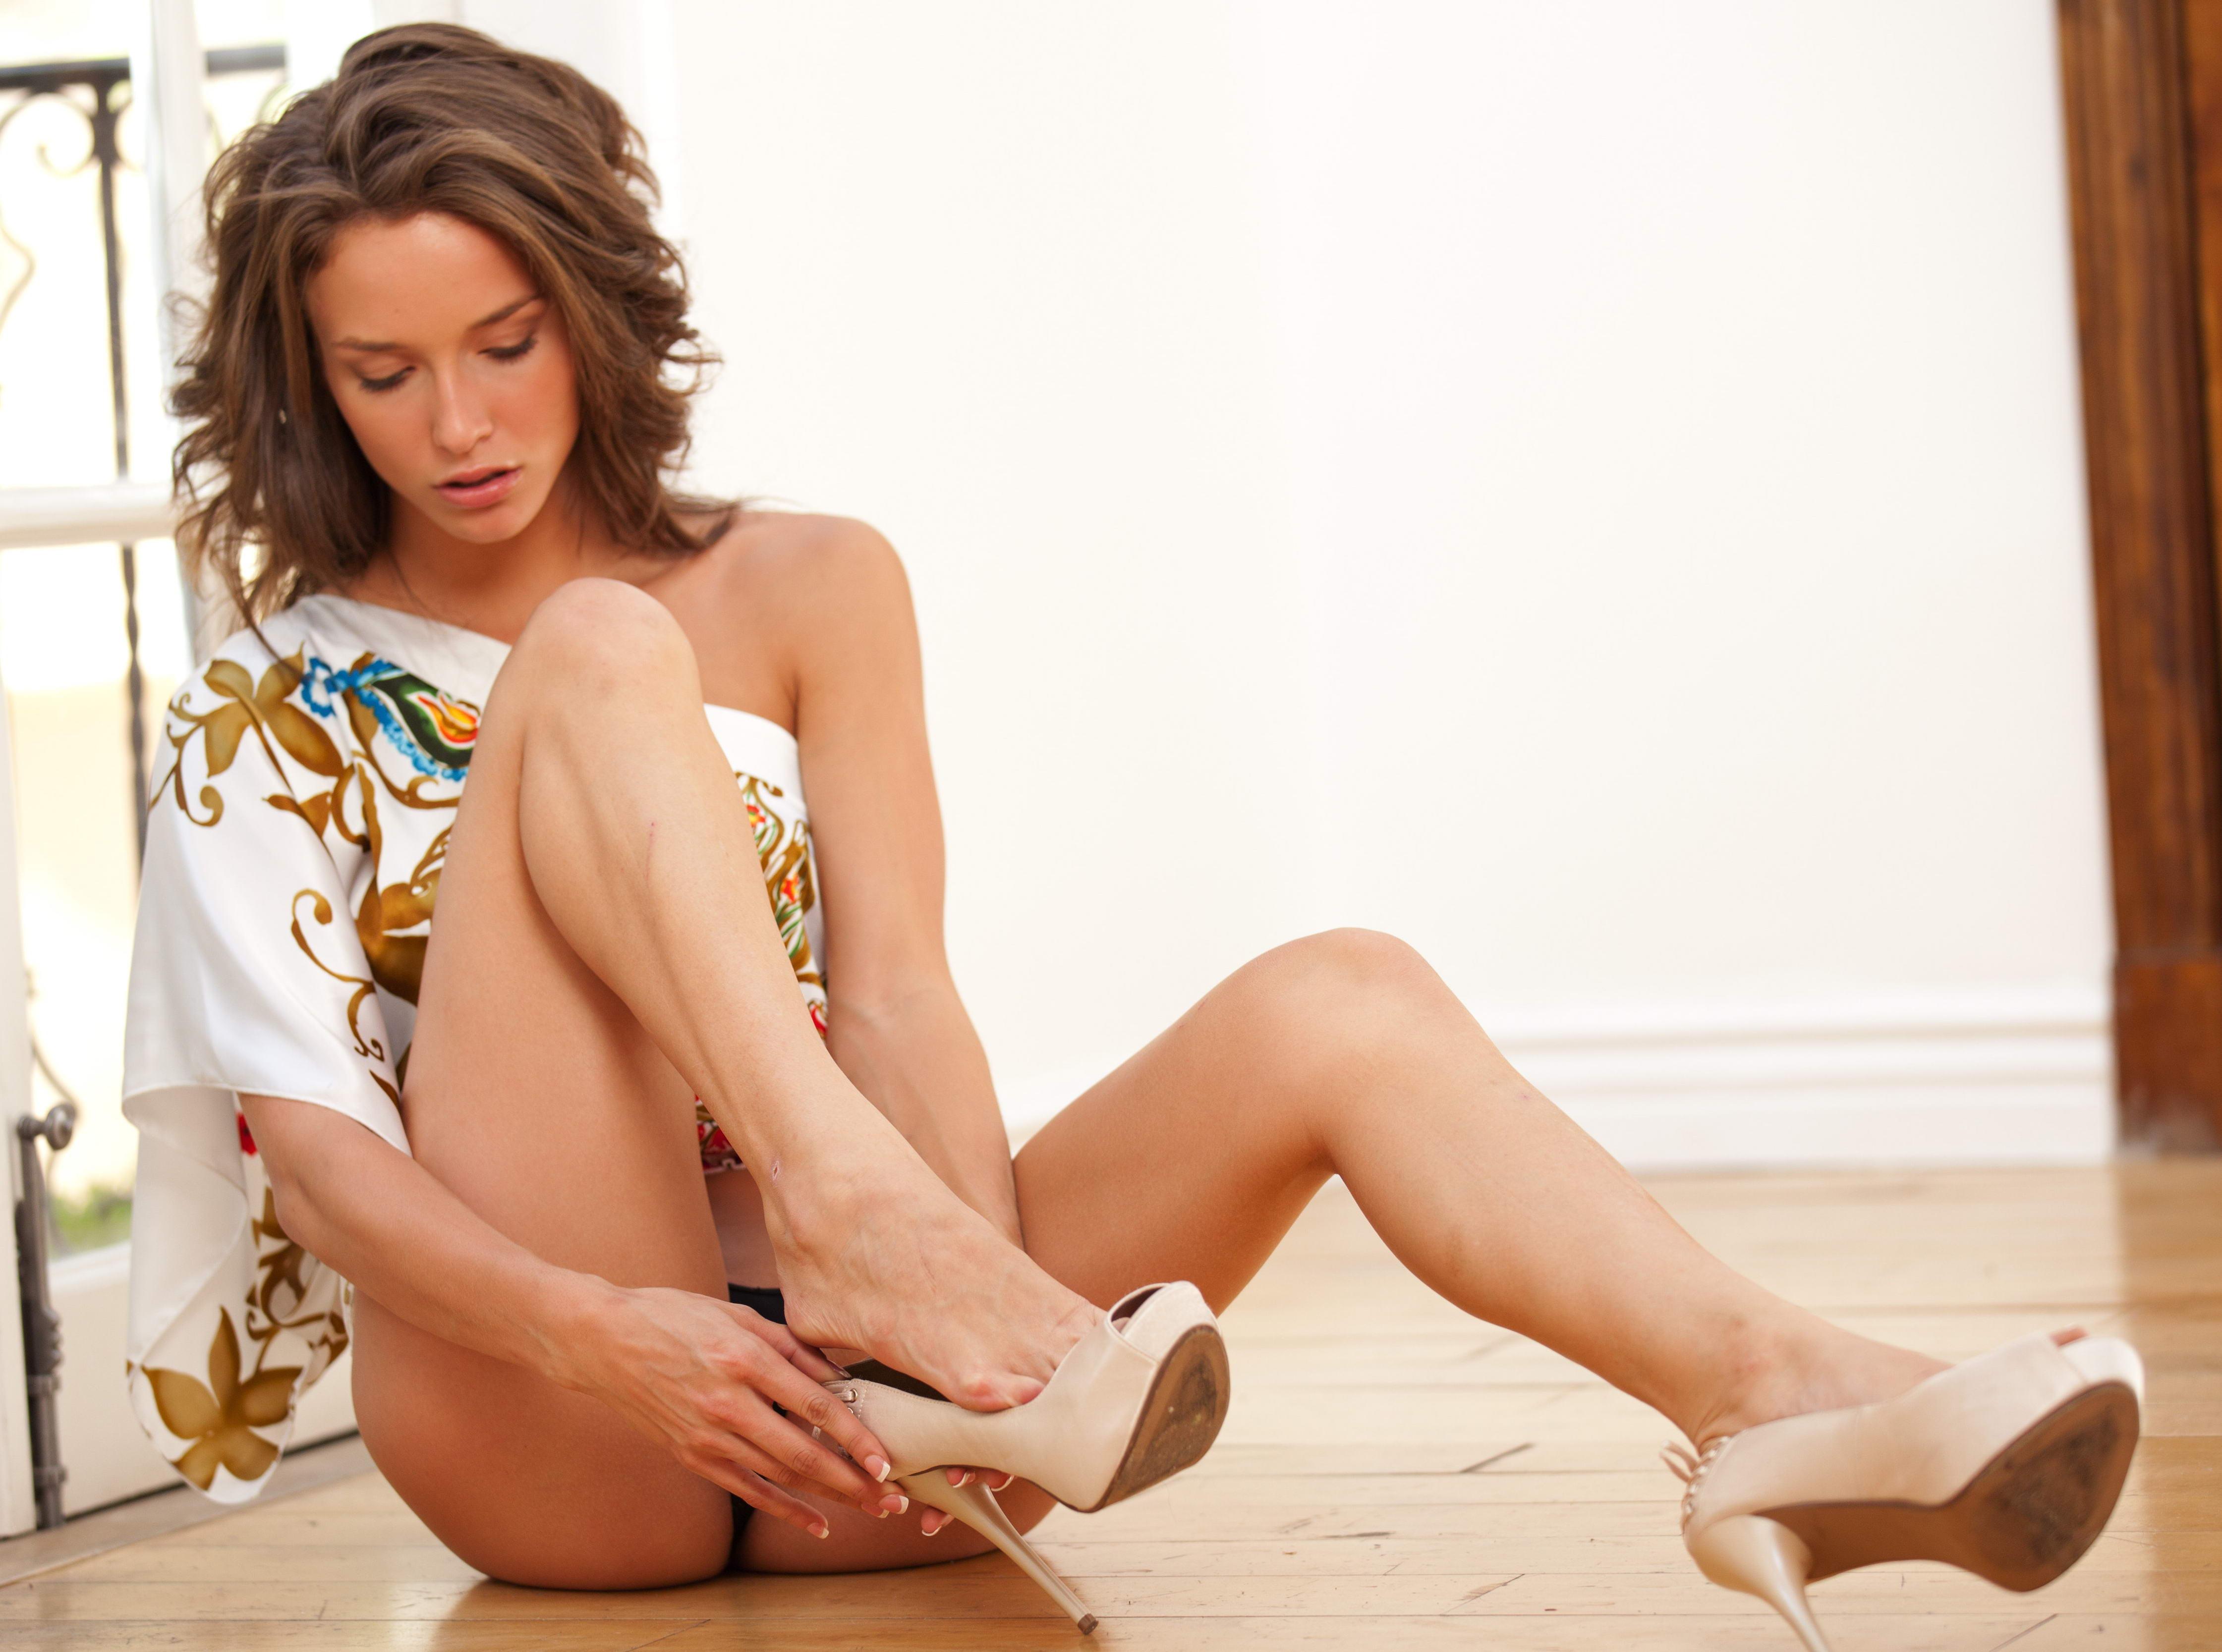 Cheap London Escorts in Sexy High Heels